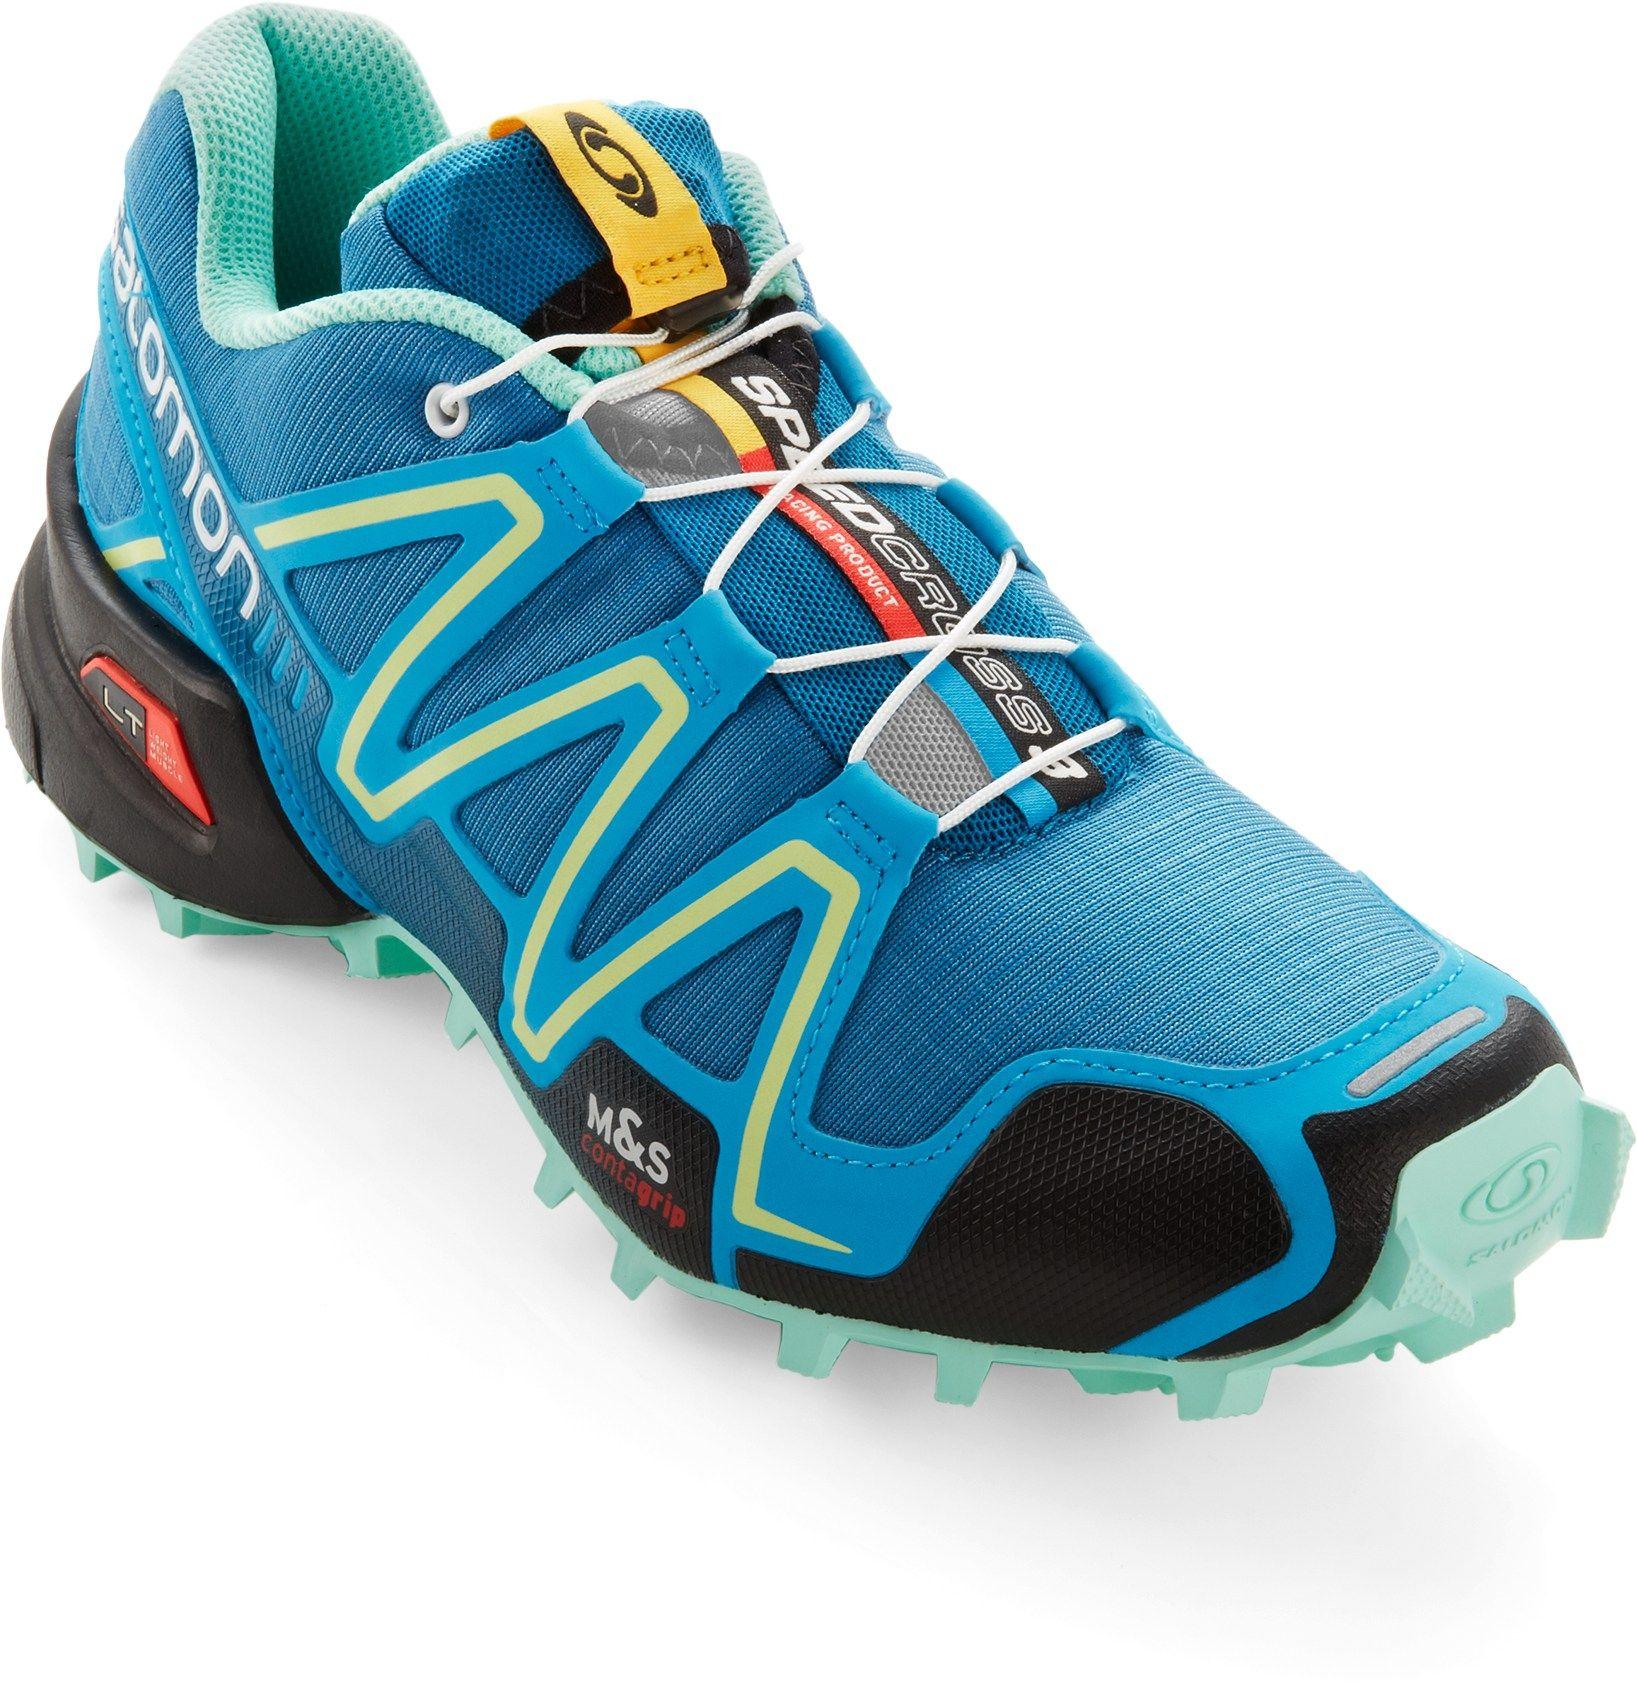 competitive price 5253e 79098 Salomon Speedcross 3 Trail-Running Shoes - Women s - REI.com   Outdoors +  Gear   Pinterest   Trail running shoes, Running shoes and Running